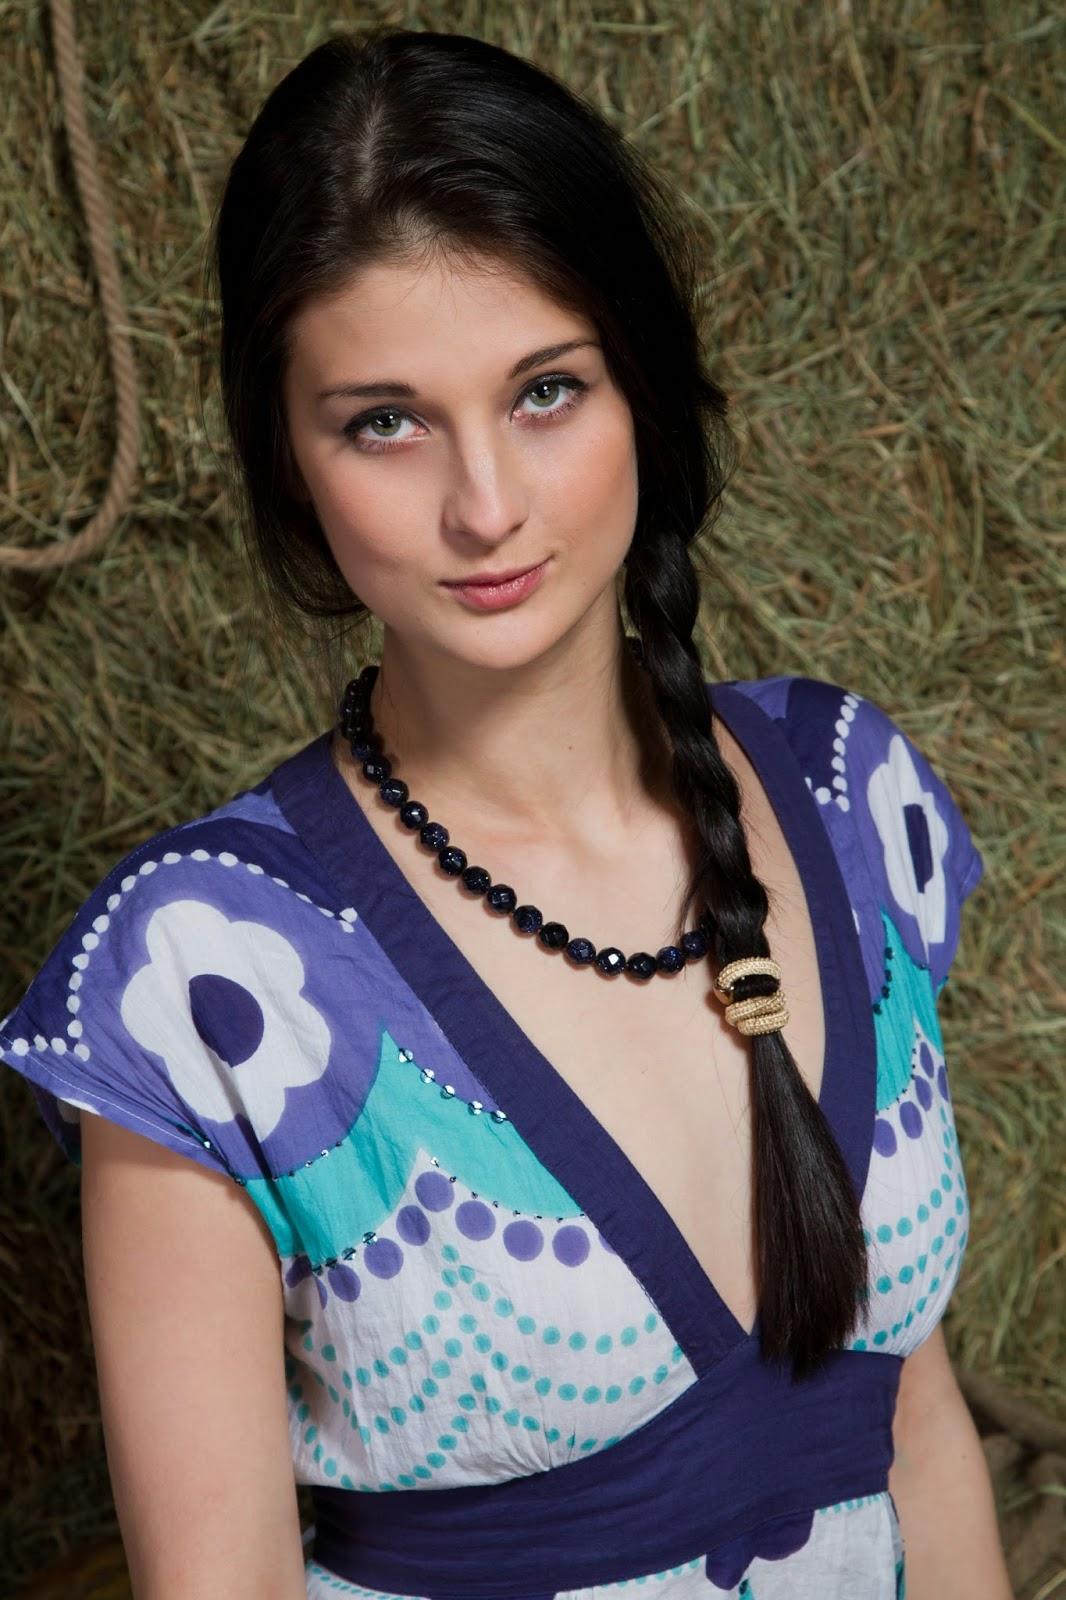 MetArt 2012-06-07 Katya AC - Prisca x130 3456x5184 [133